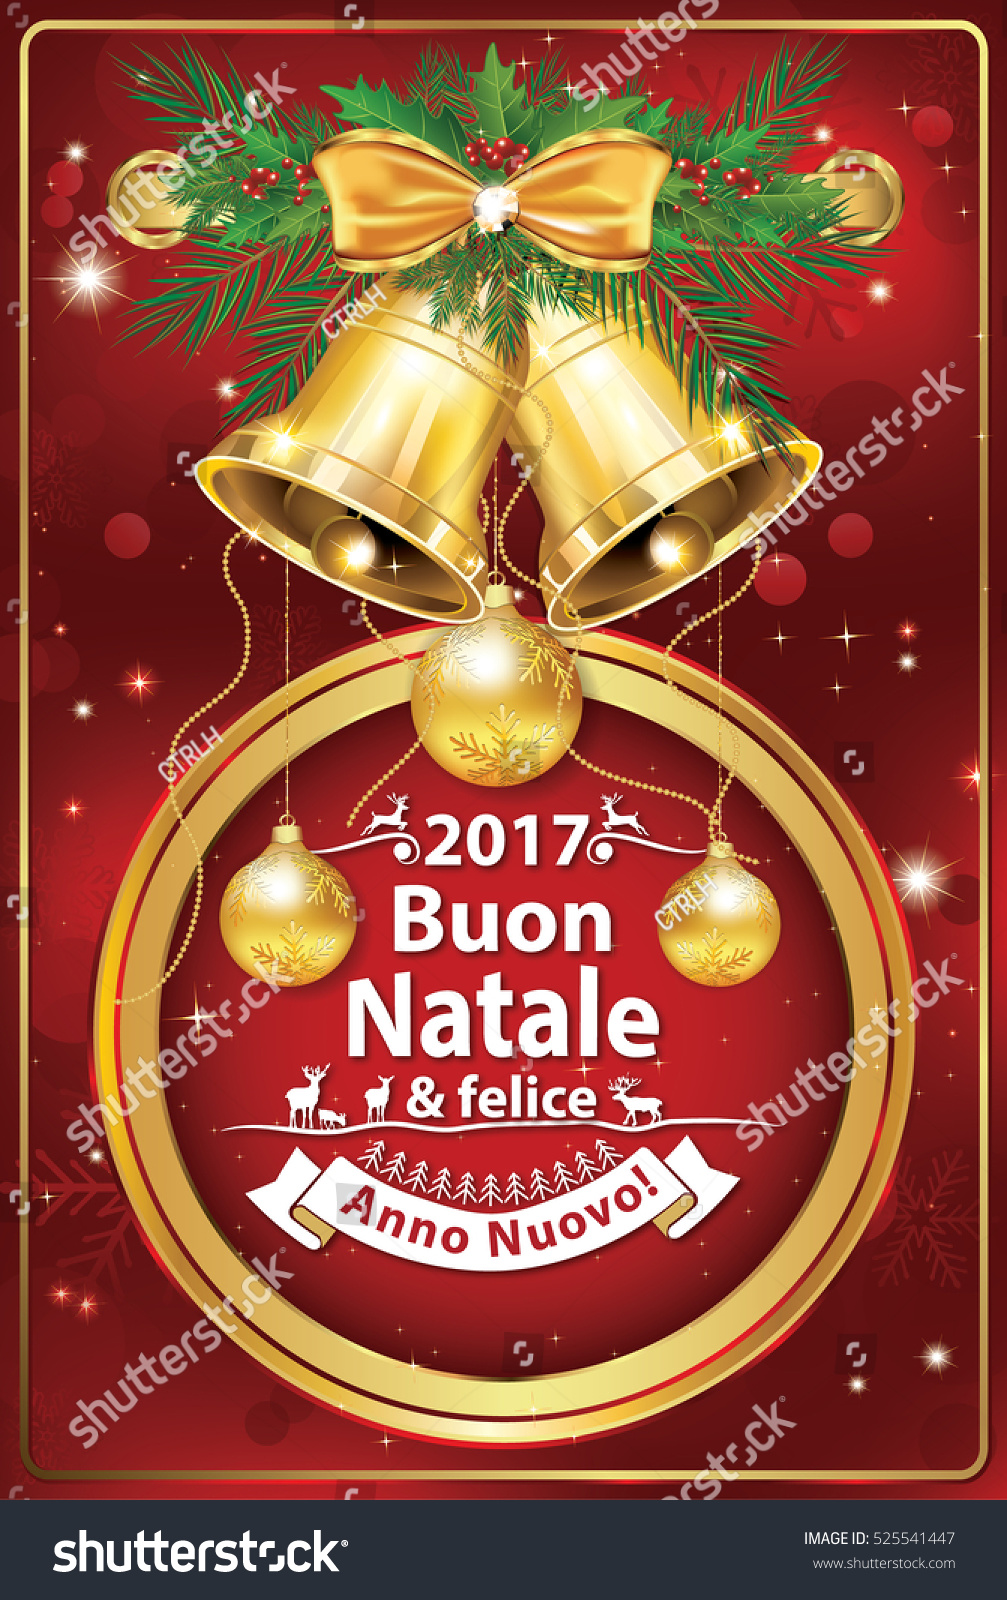 Italian Seasons Greetings Winter Holiday Greeting Stock Illustration